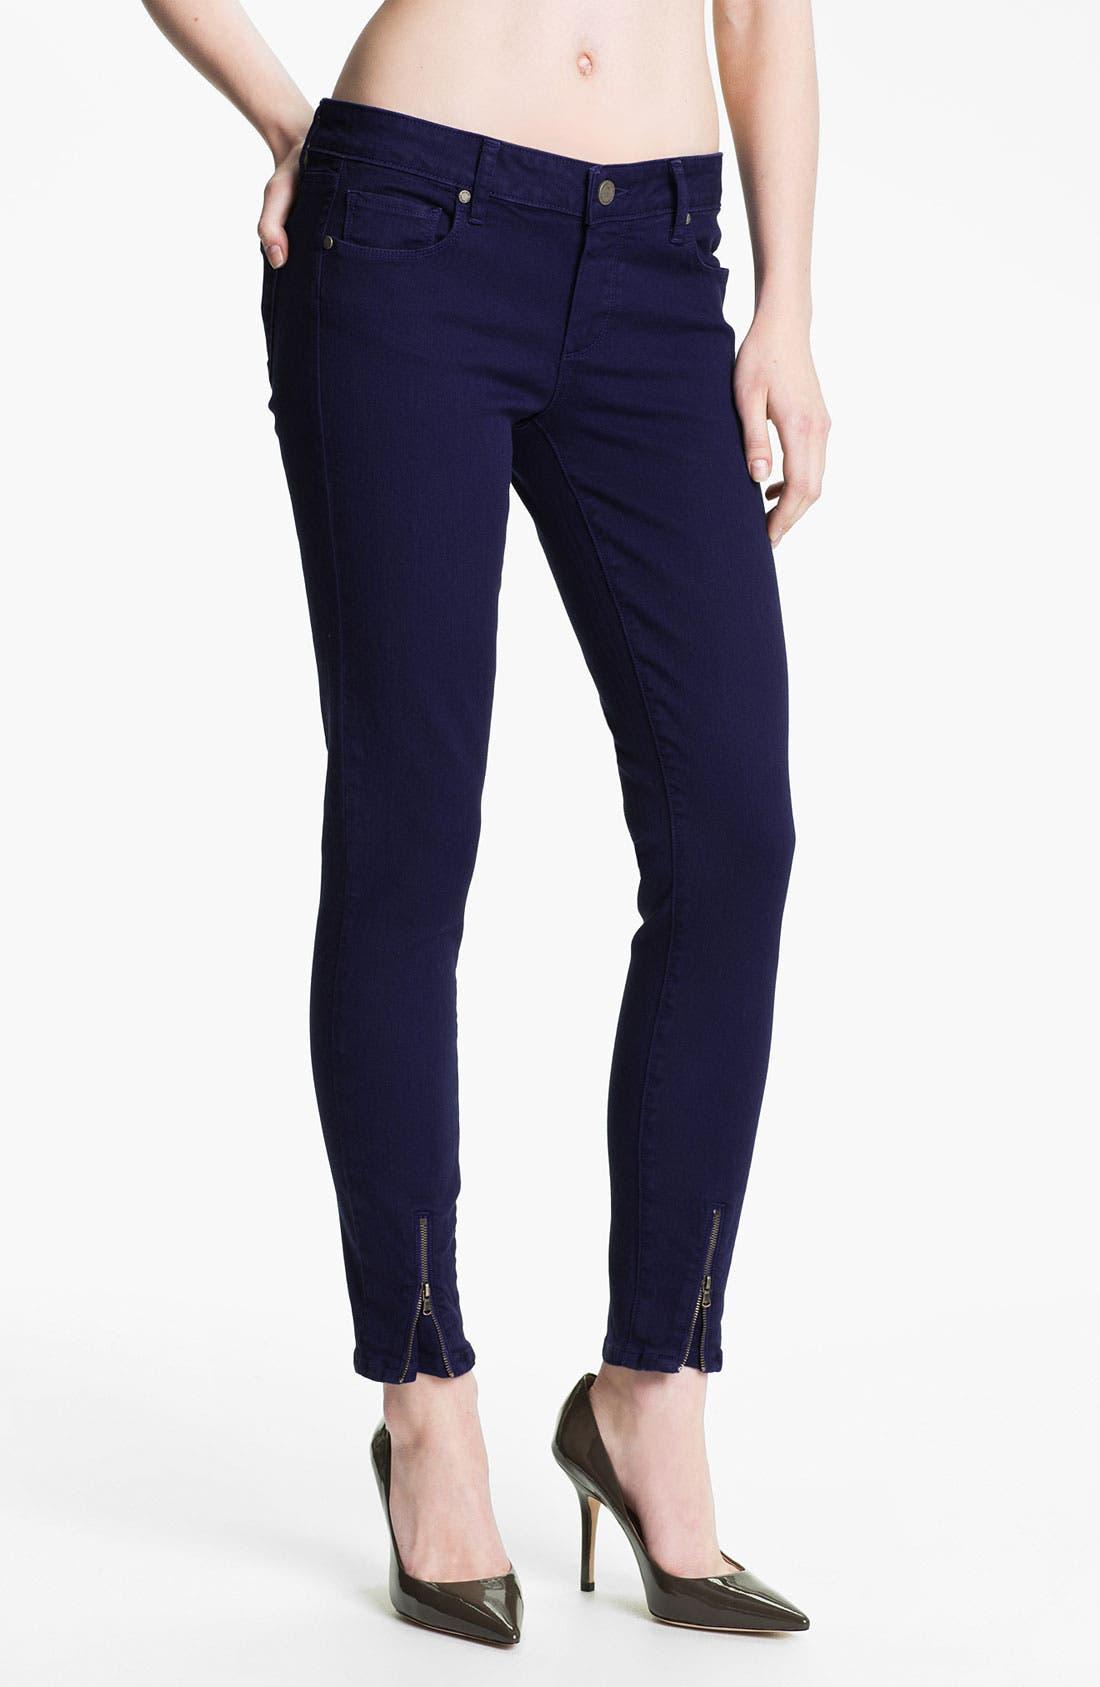 Main Image - Paige Denim Ankle Zip Skinny Jeans (Pacific Dusk)